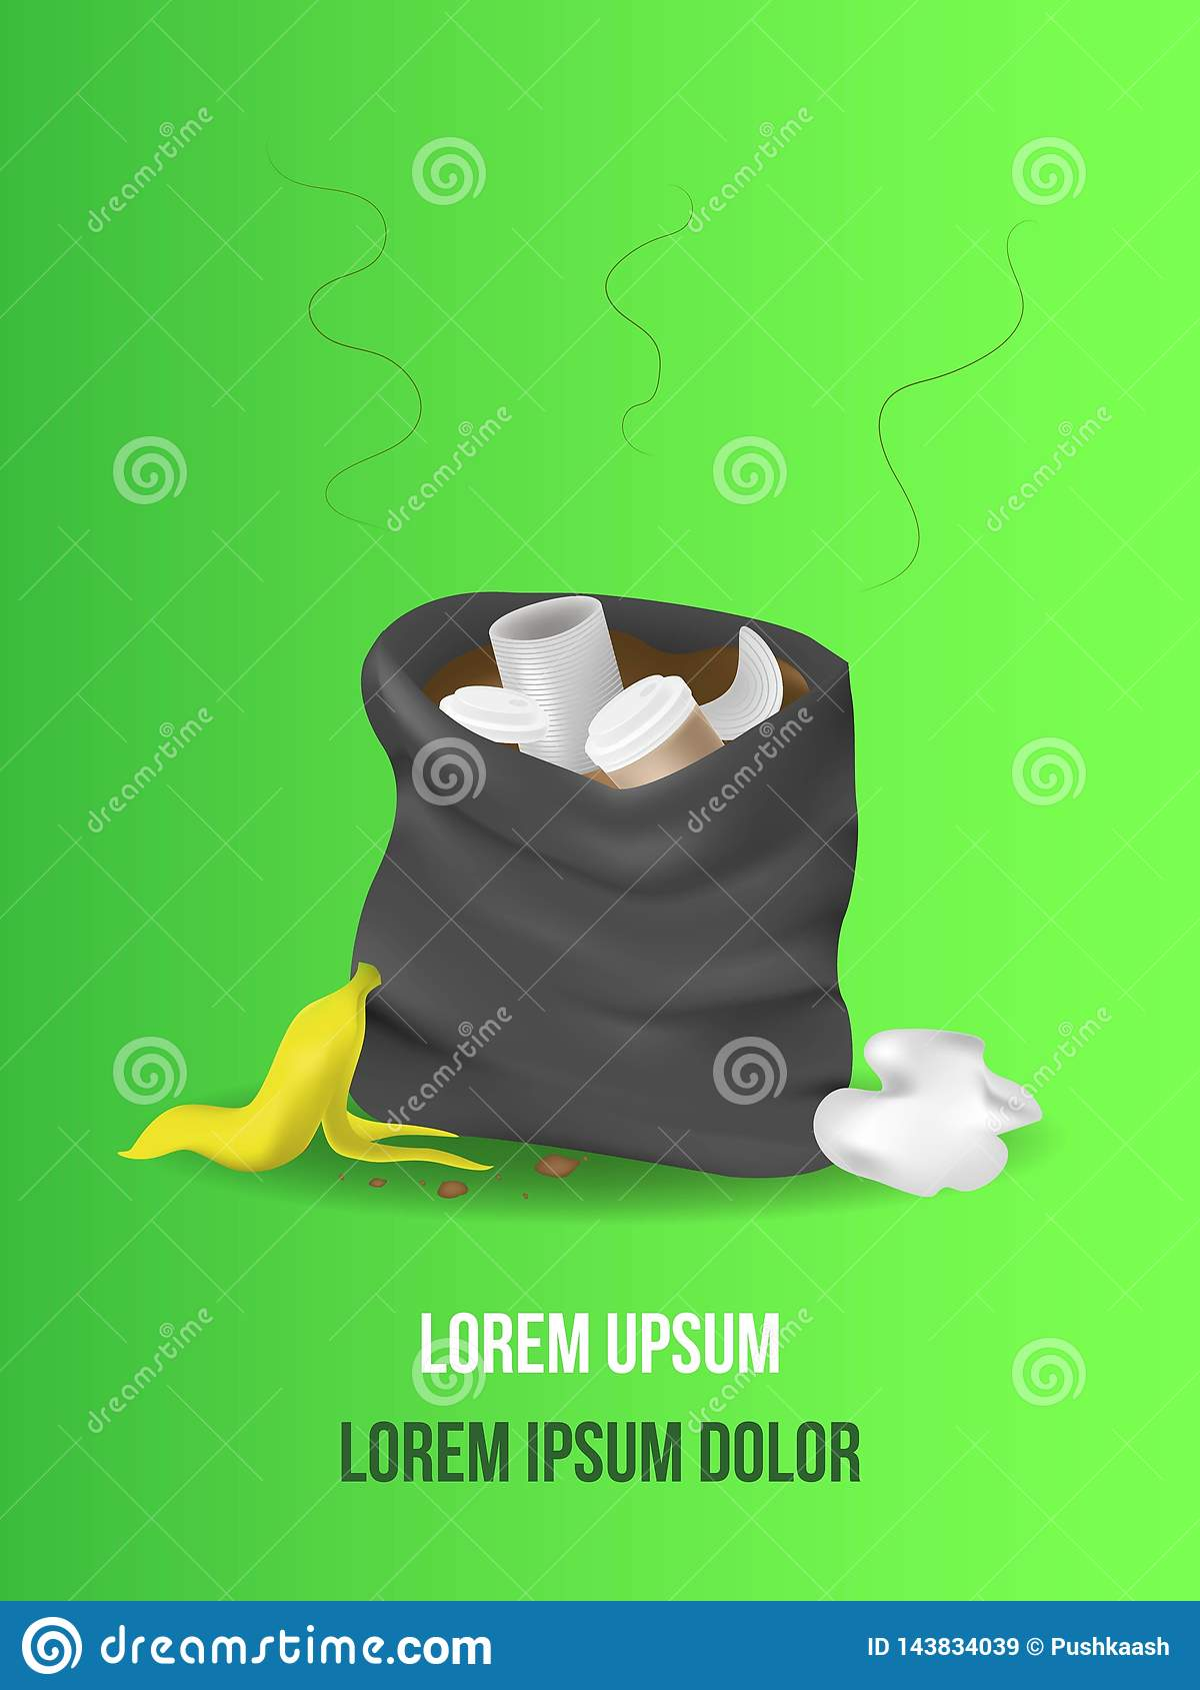 Black garbage bag open. sack Rubbish. sackful trash. litter. peel from banana, metal can, crumpled paper, paper cup